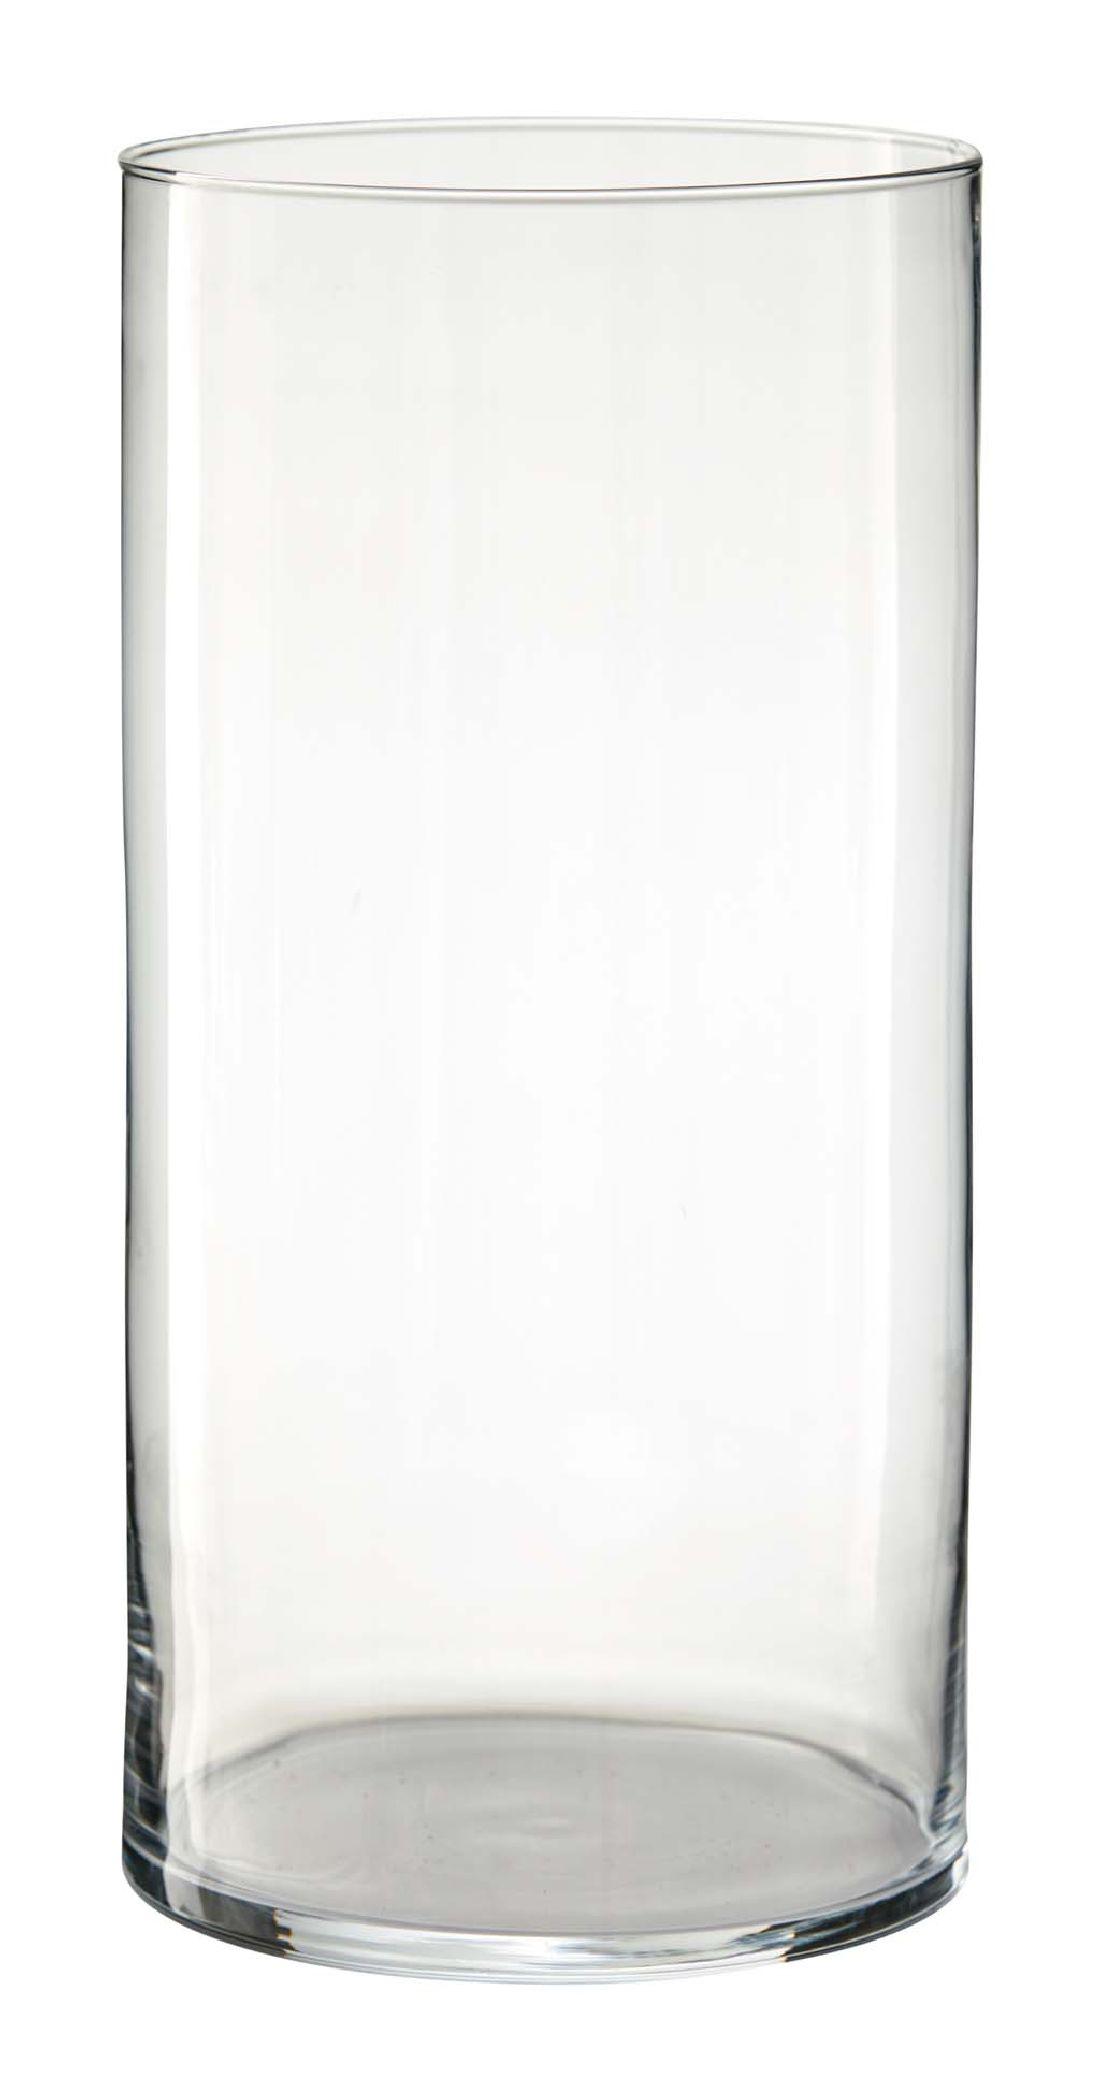 Zylinder Glas KLAR 1853/30 Ø19xh30cm